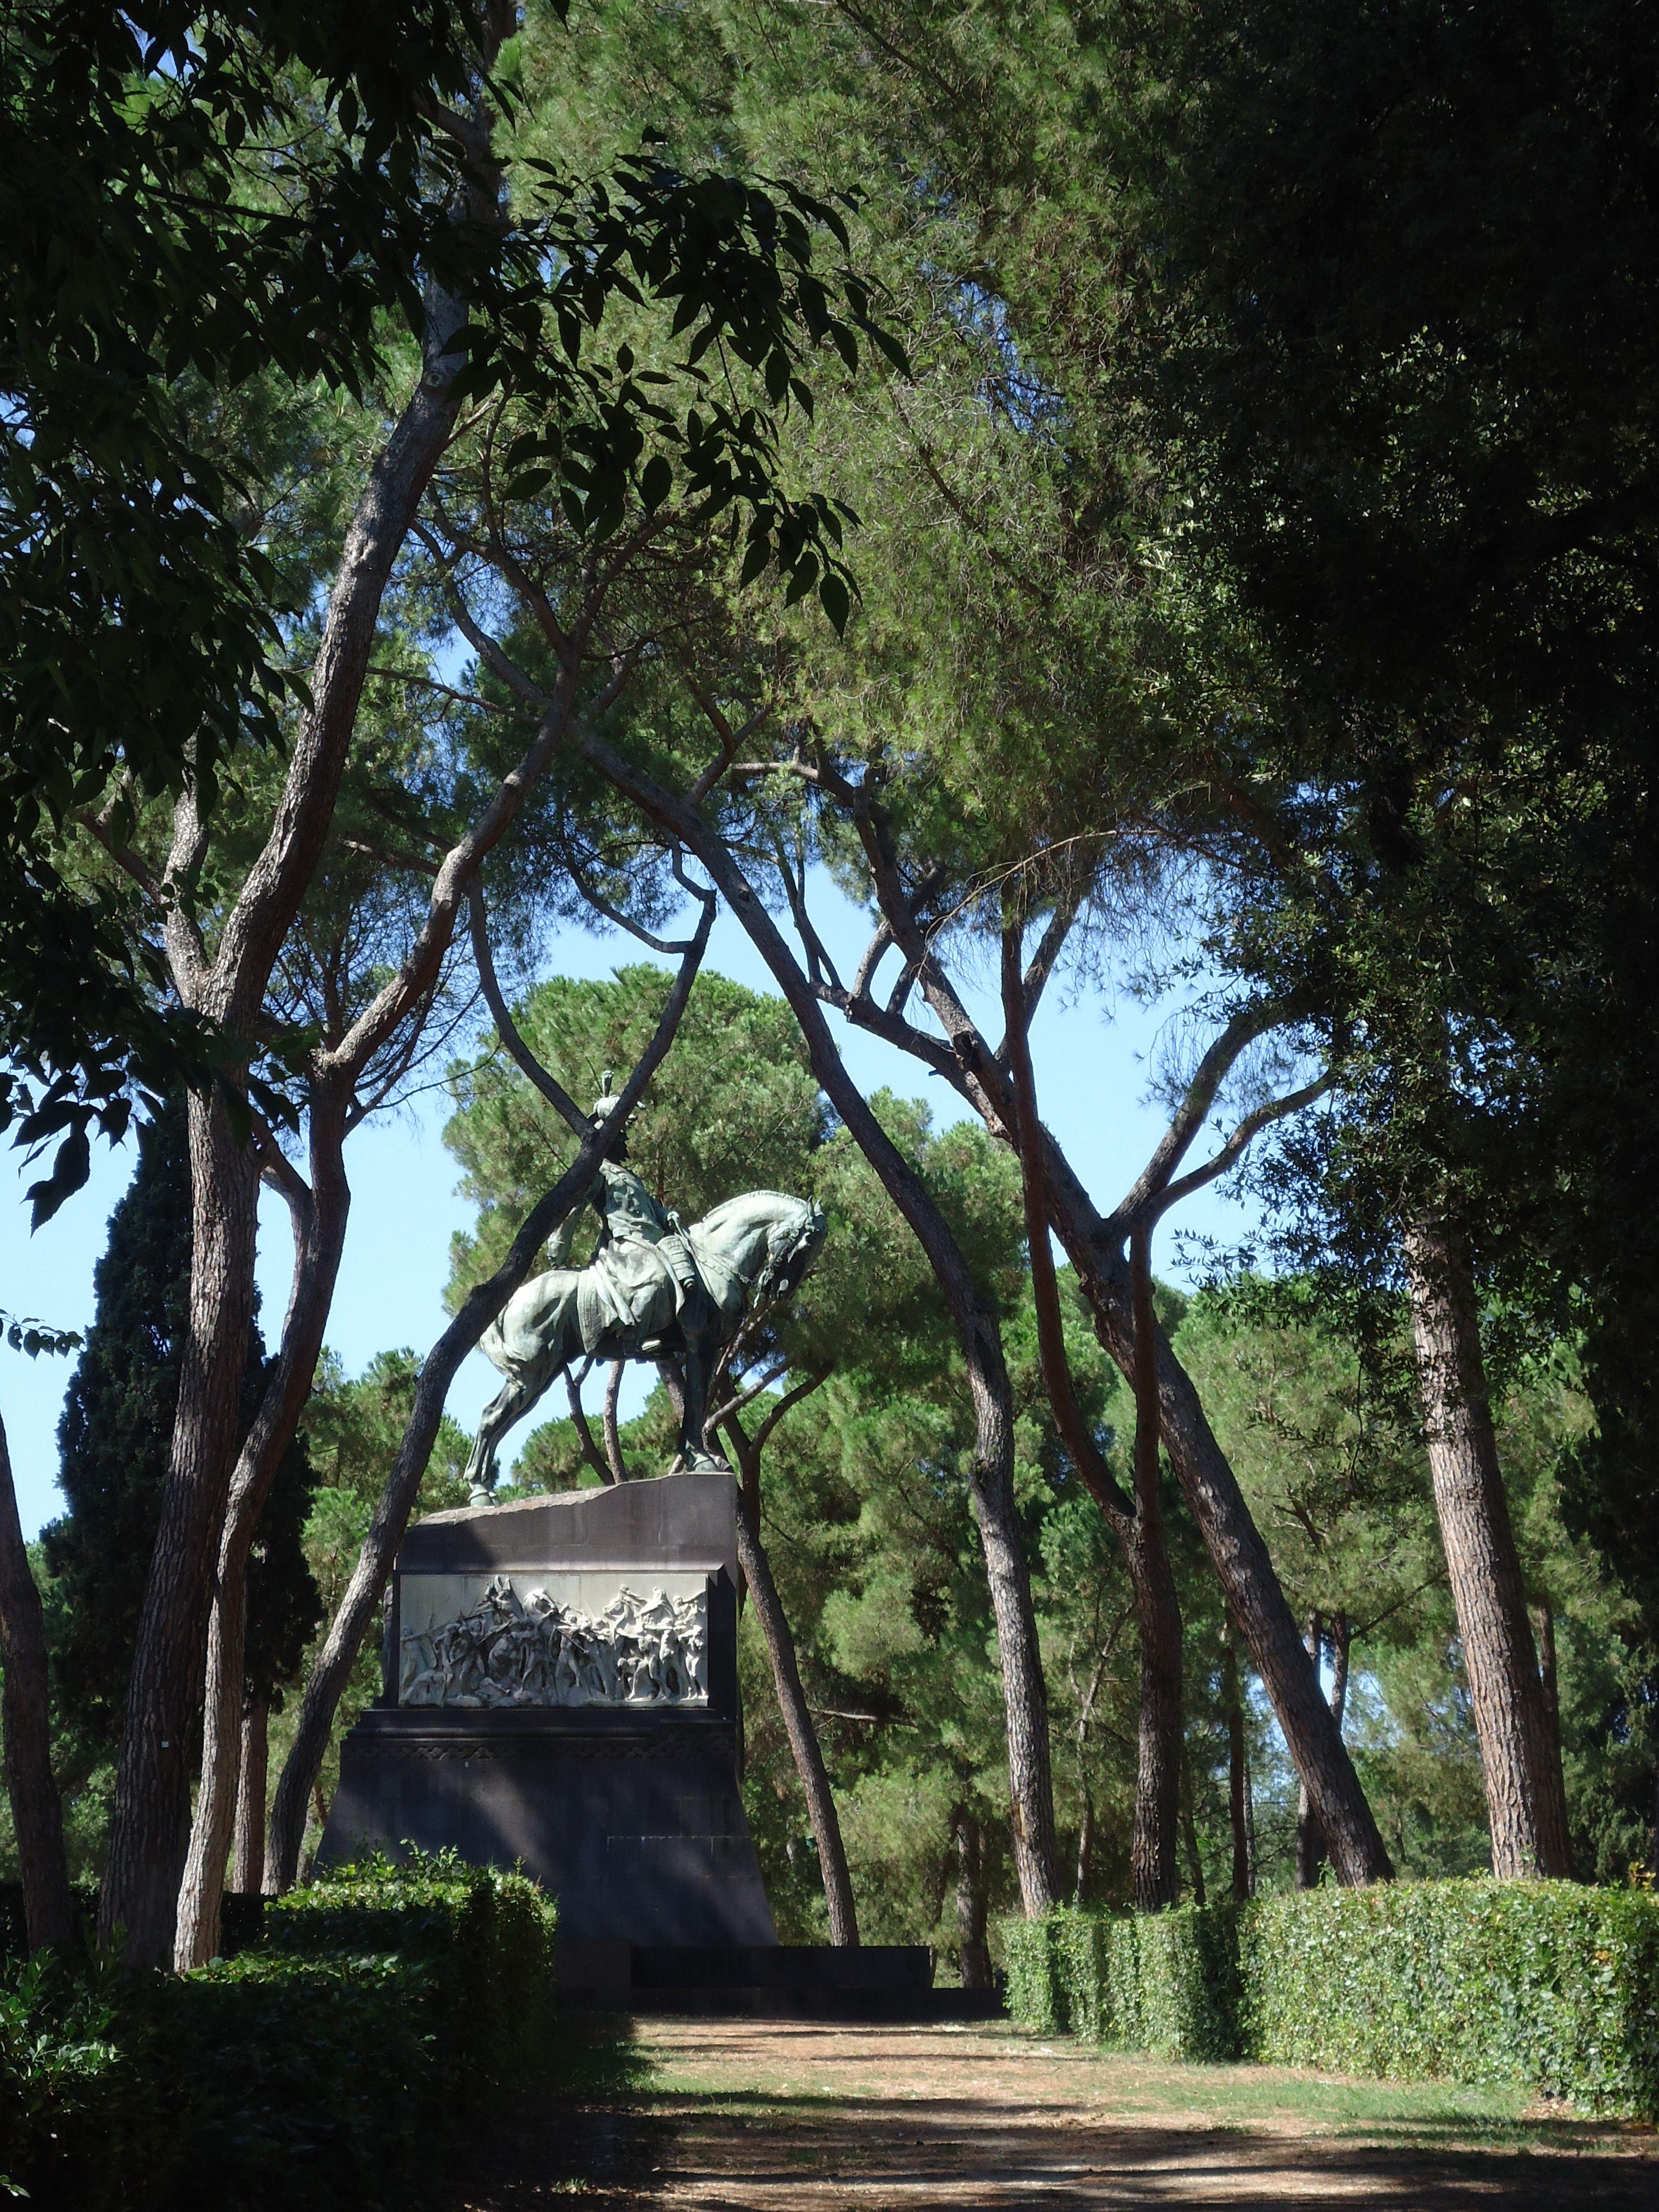 Ruiter te paard - Villa Borghese - Rome